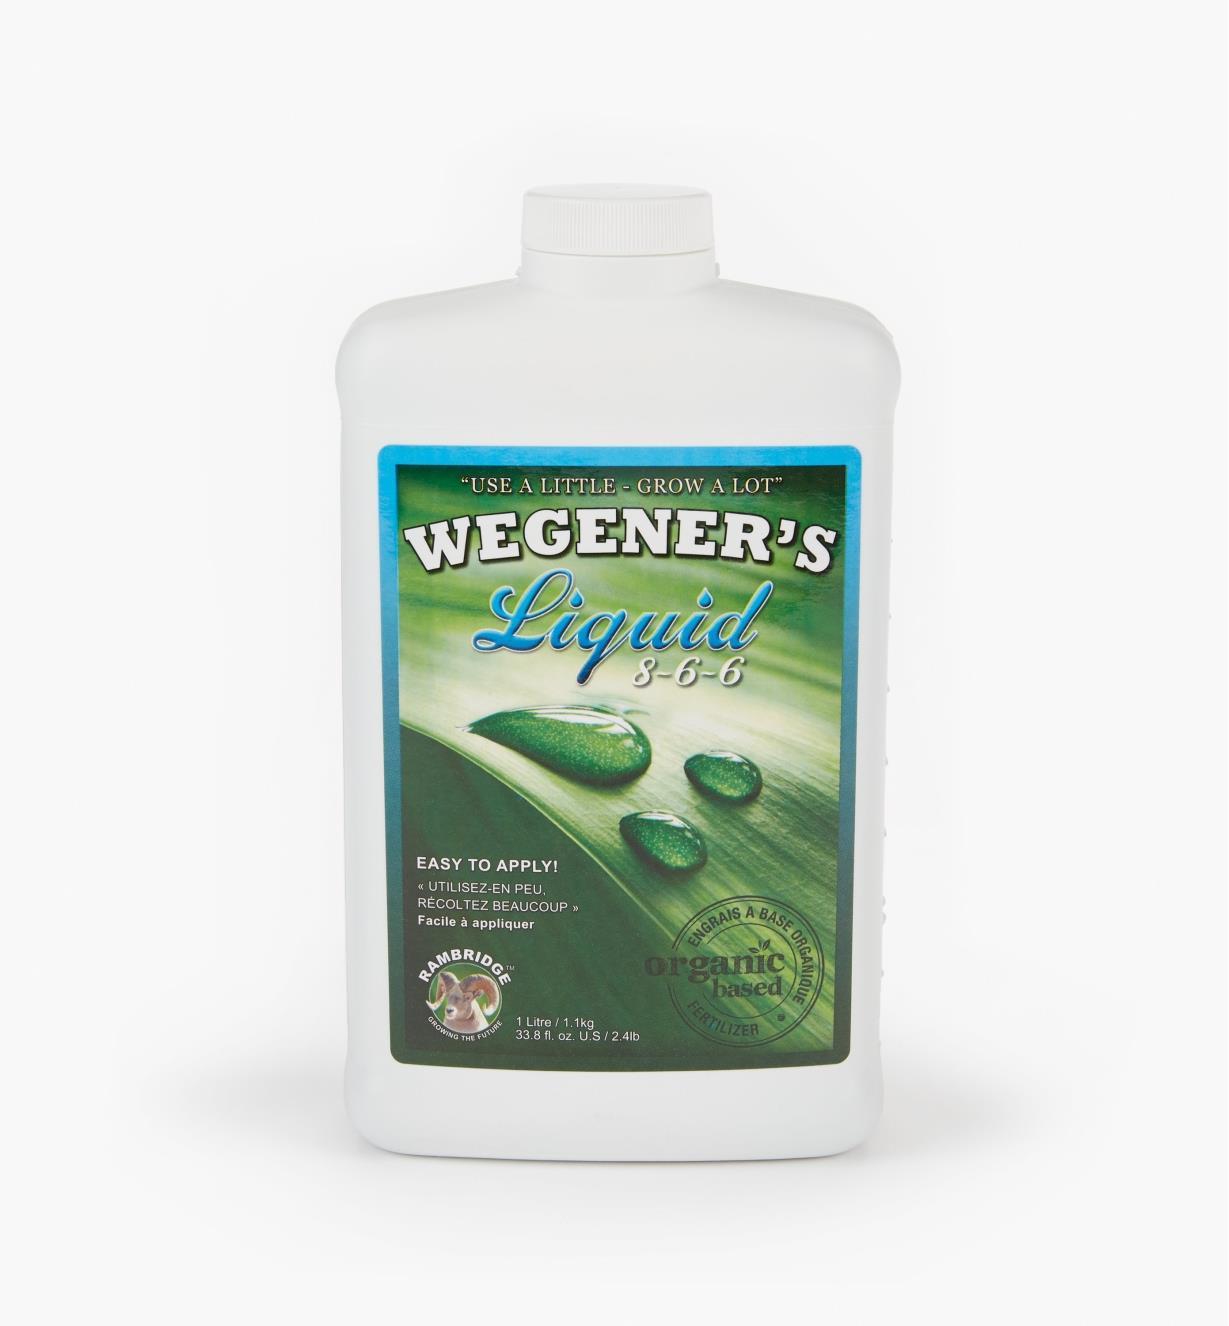 HK565 - 1 litre (34 fl oz) Organic Growth Promotant 8-6-6